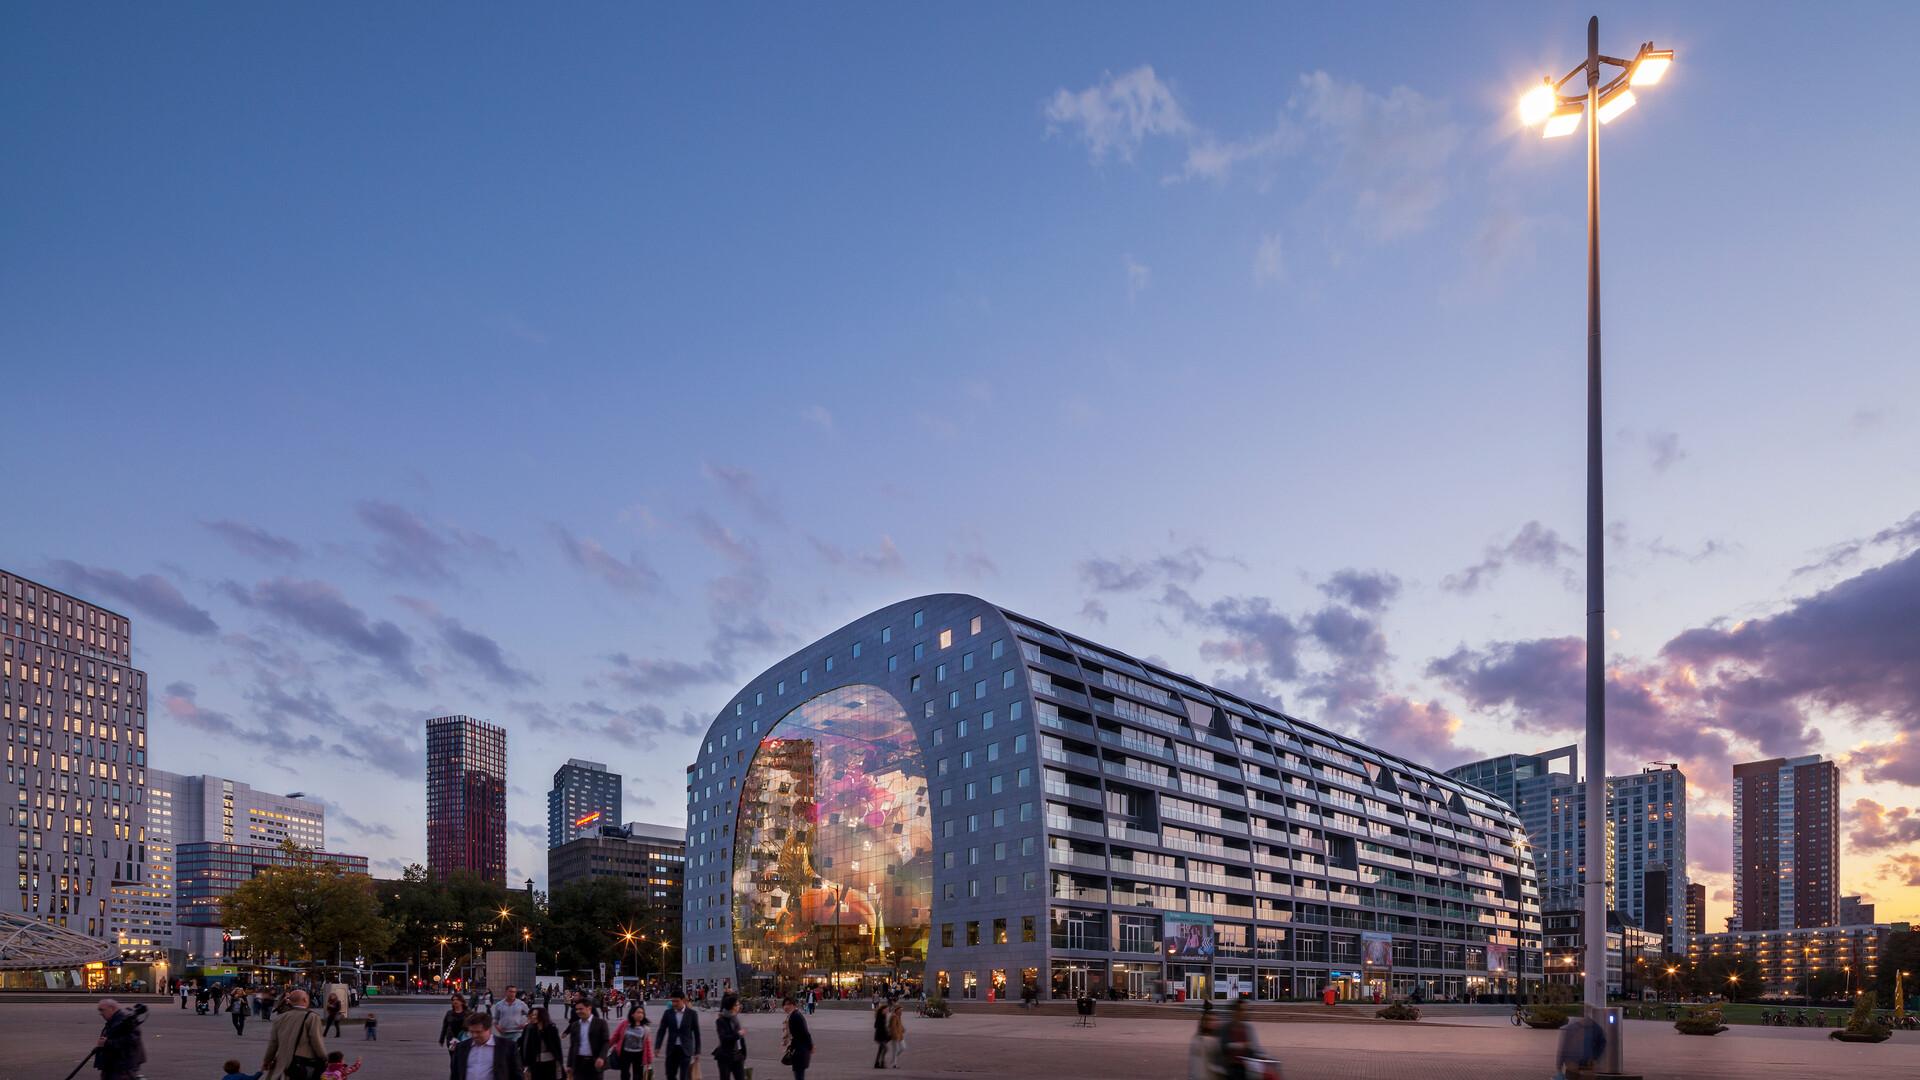 NL-Markthal 20141010 Markthal, Rotterdam, the Netherlands, MVRDV, Pennings Akoestiek, ROCKFON Mono Acoustic, Dark grey